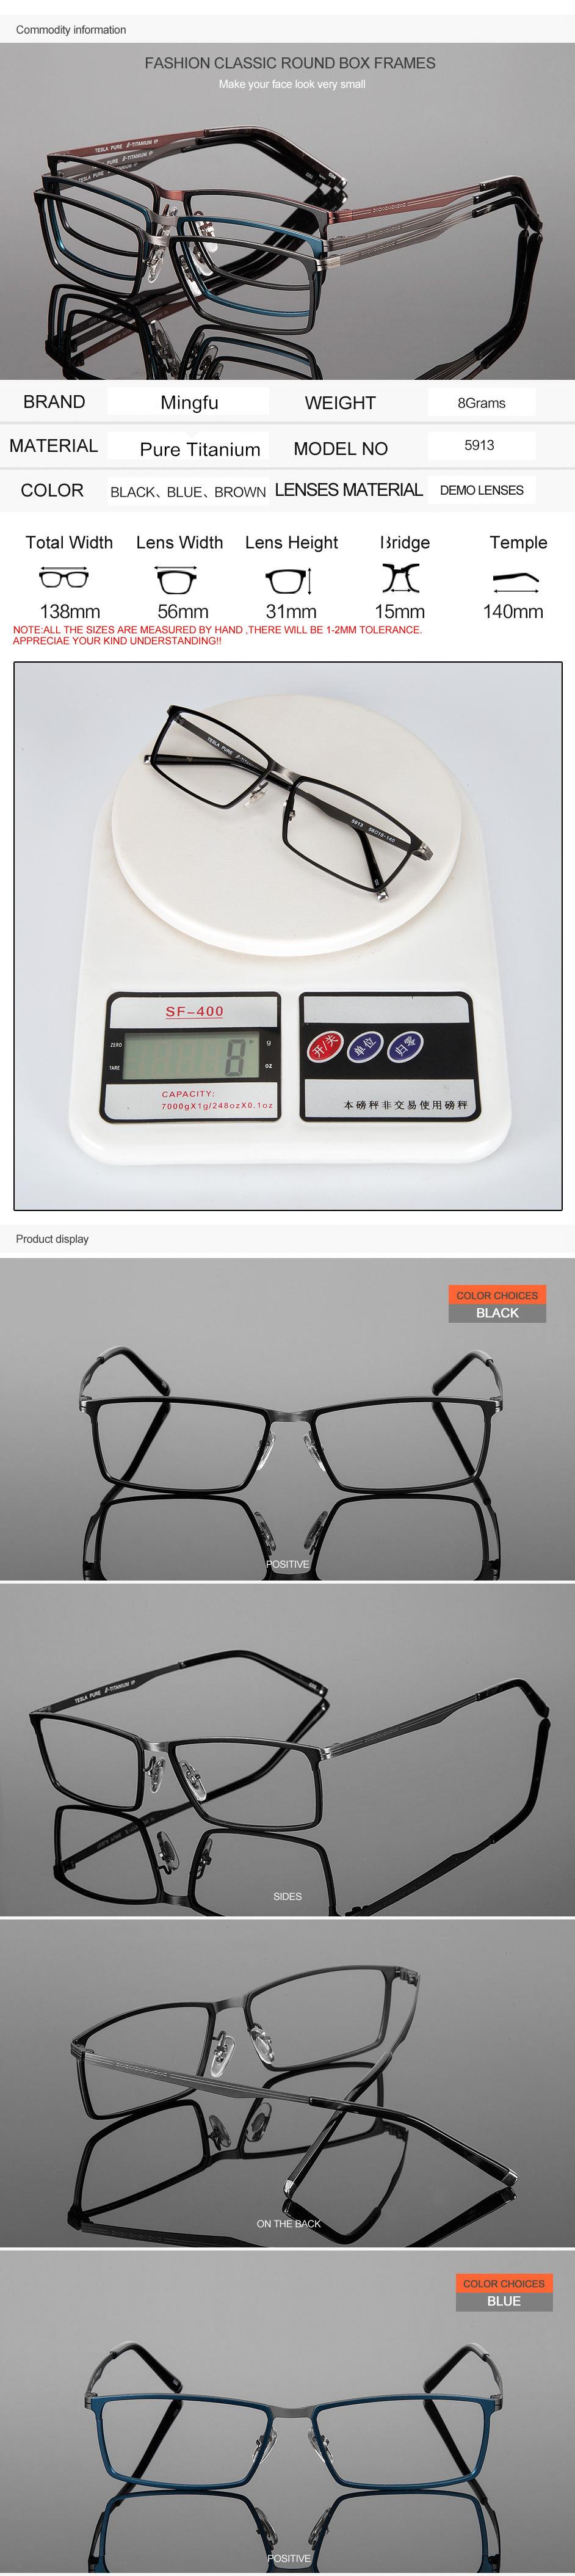 02d498df30 Pure Titanium Eyeglasses Rimless Optical Frame Prescription Spectacle  Frameless Glasses For Men Eye glasses Silicon Foot 16123USD 26.99 piece